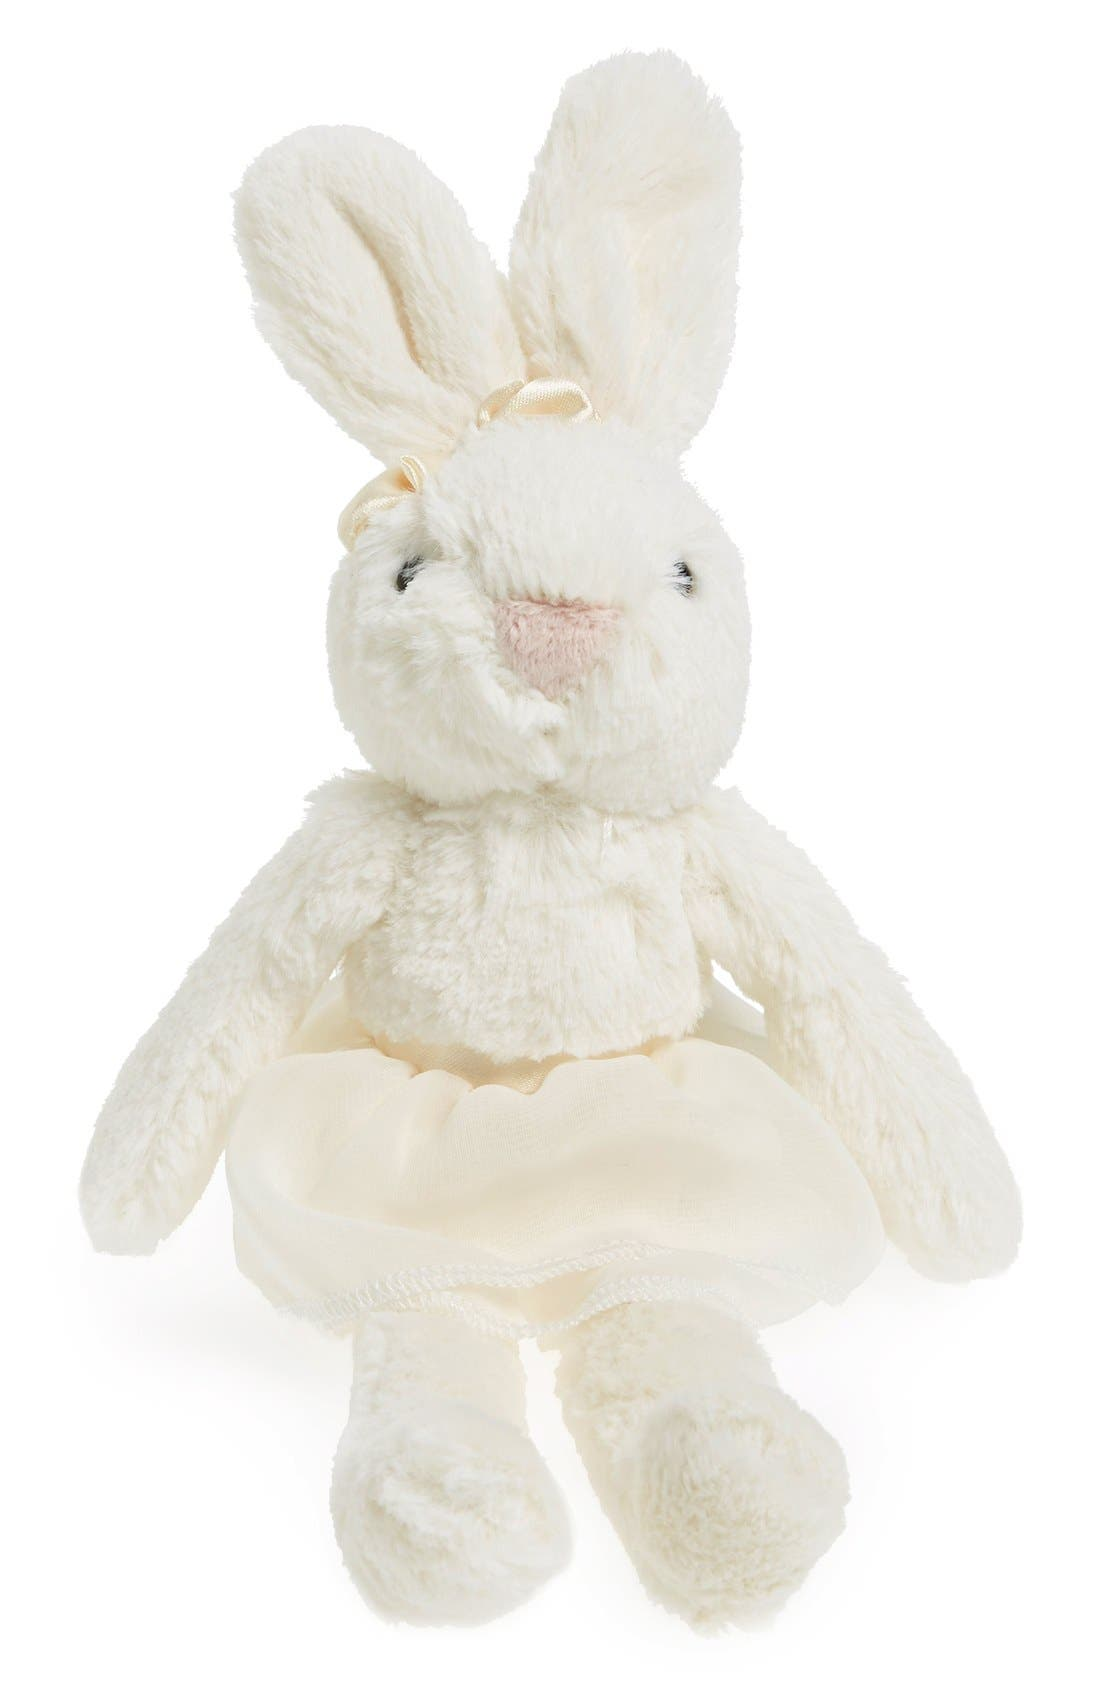 'Plum Bunny' Stuffed Animal,                             Main thumbnail 1, color,                             Cream